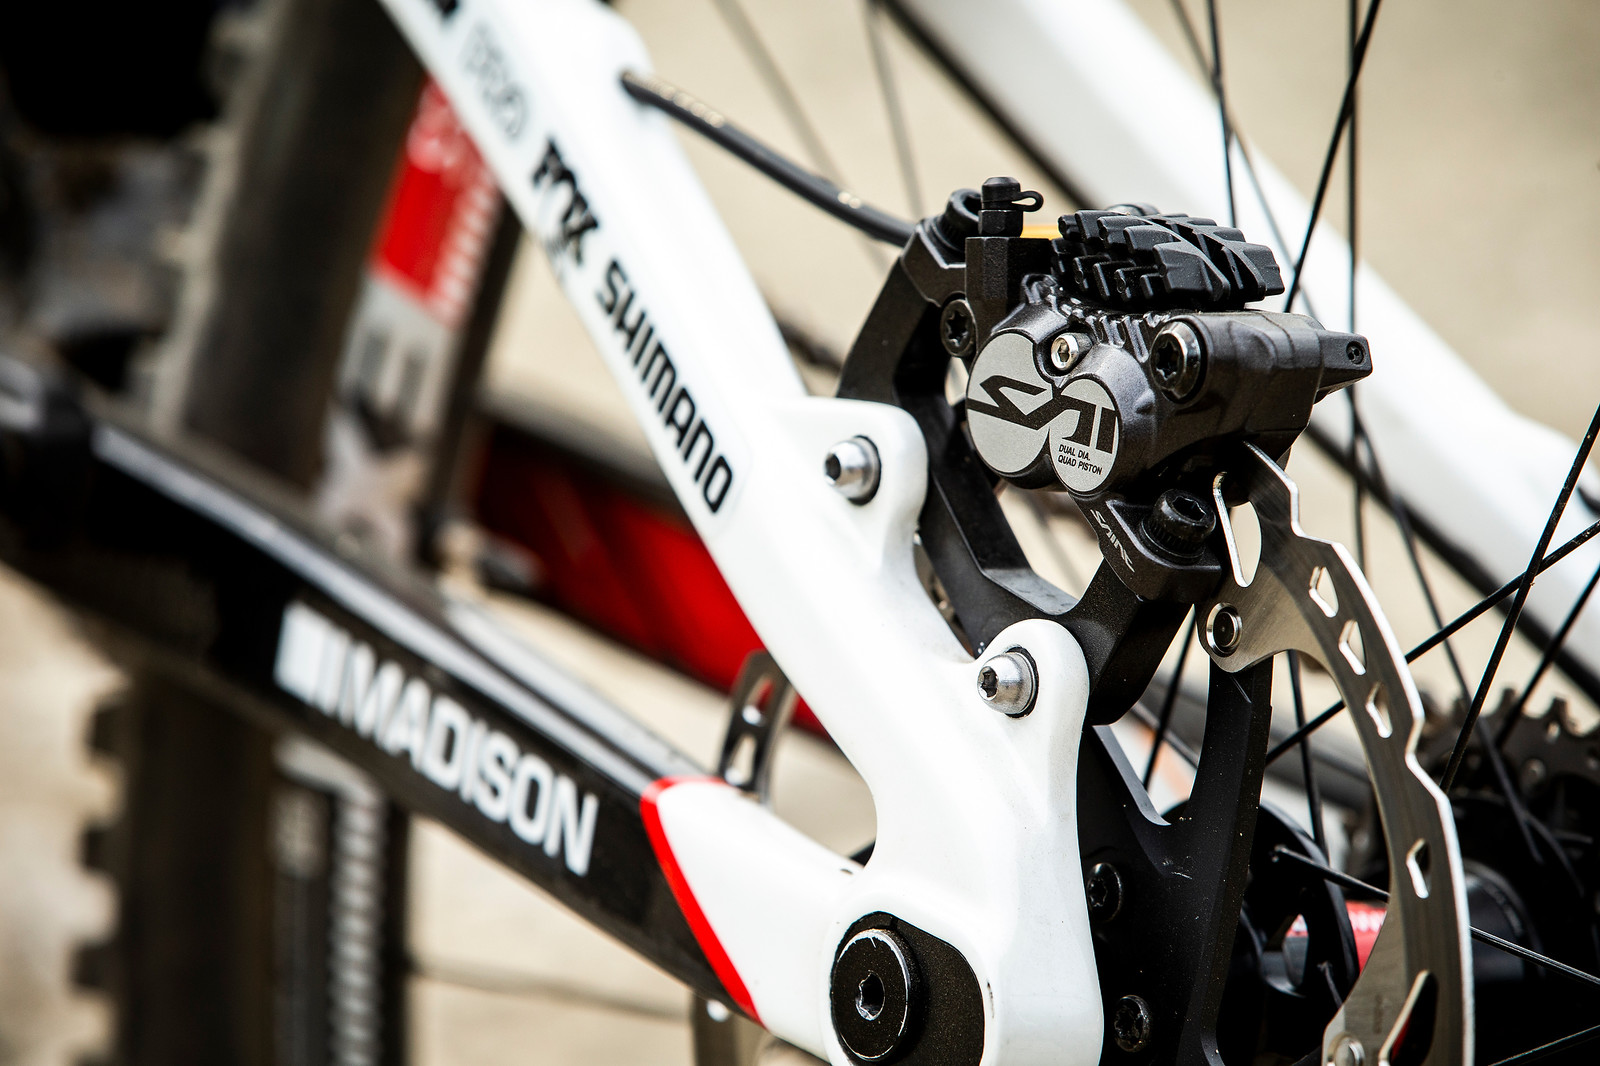 Shimano Saint Brakes - WINNING BIKE - Danny Hart's Saracen Myst - Mountain Biking Pictures - Vital MTB